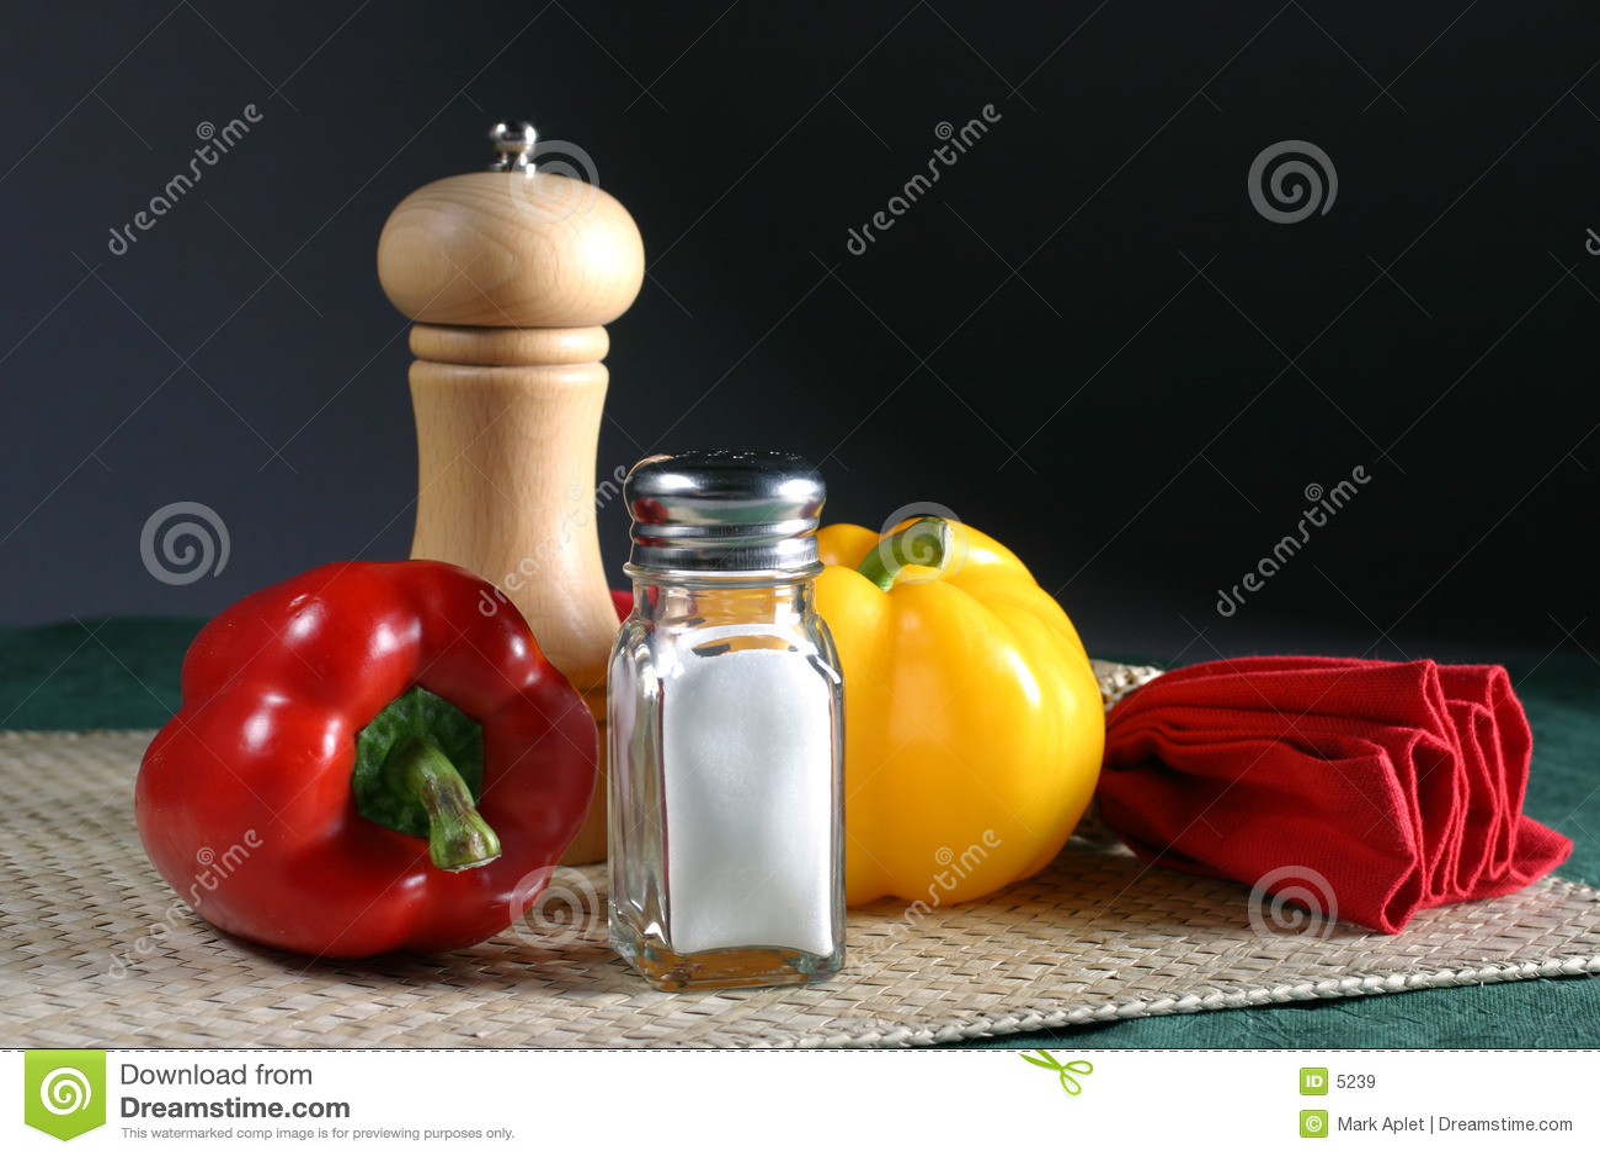 Sal & pimenta